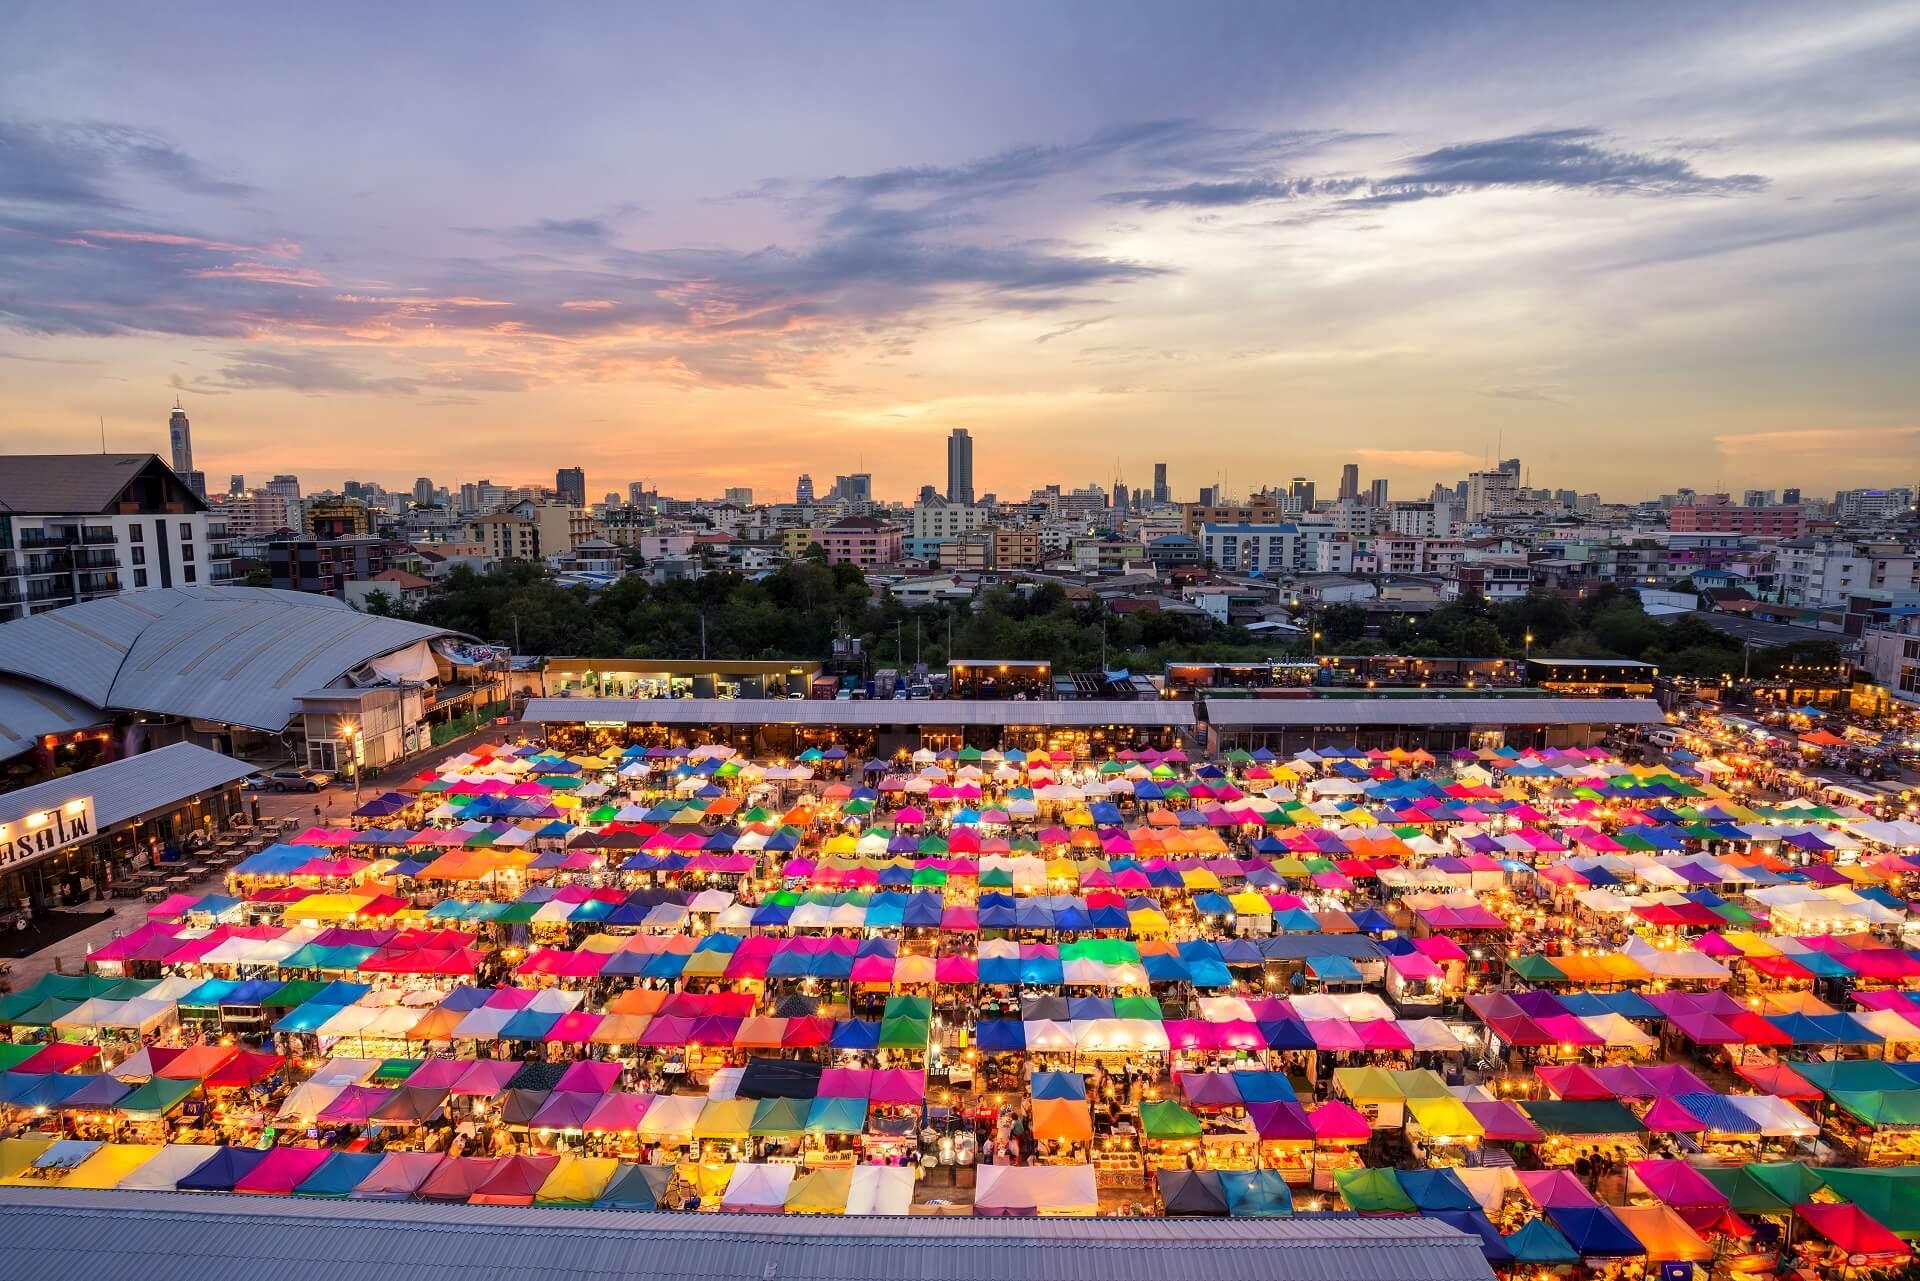 Märkte in Bangkok sind sehr beliebt